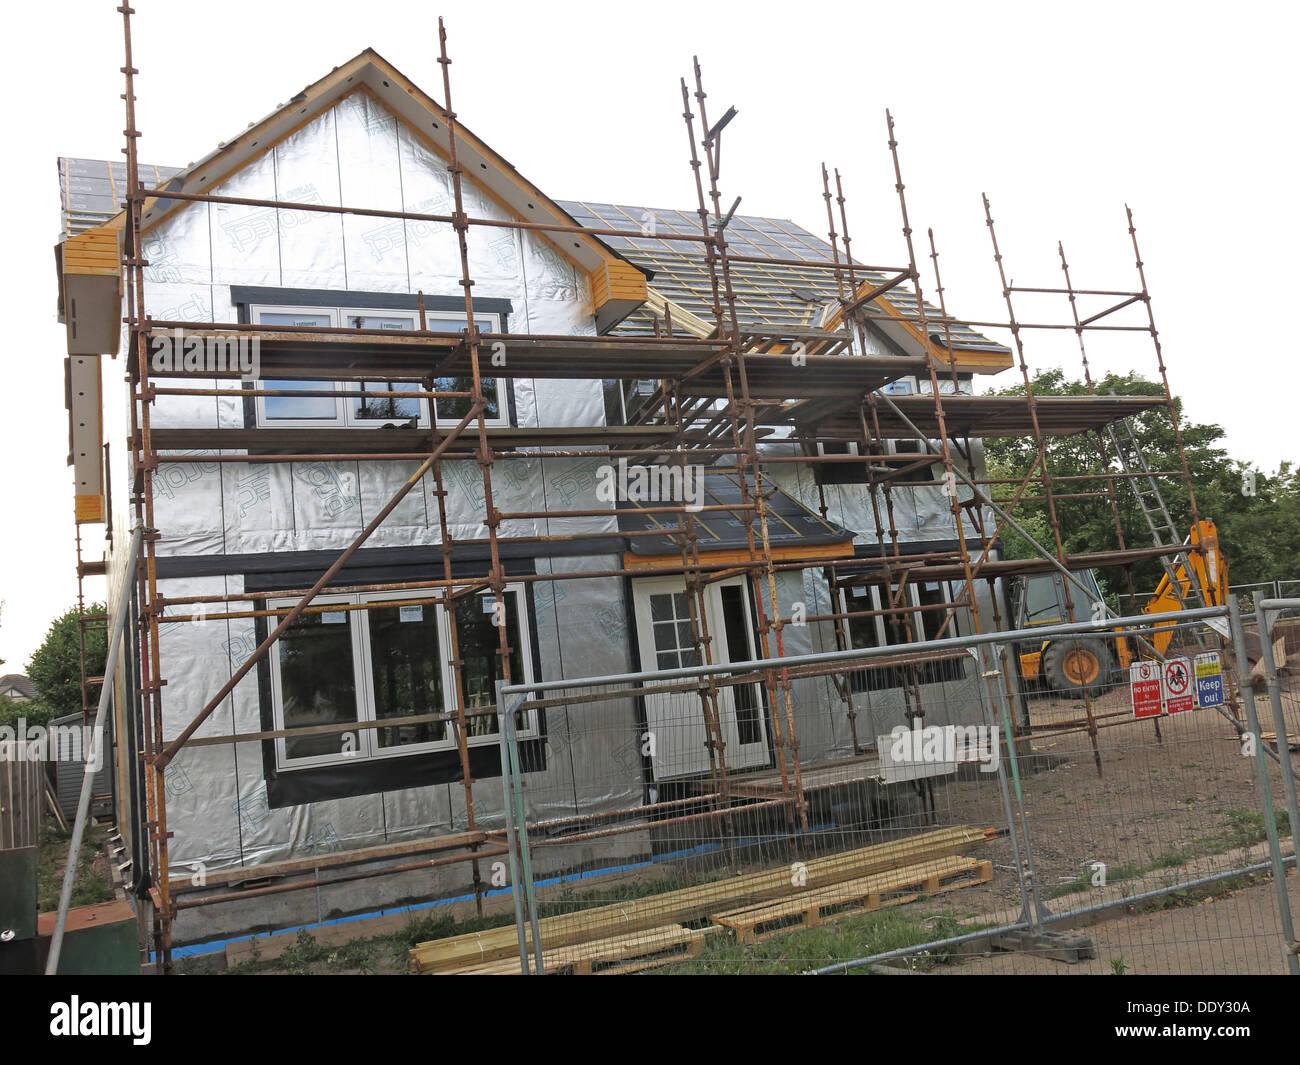 Timber Framed House under construction Eskbank Dalkeith Midlothian Scotland UK showing silver reflective foil - Stock Image